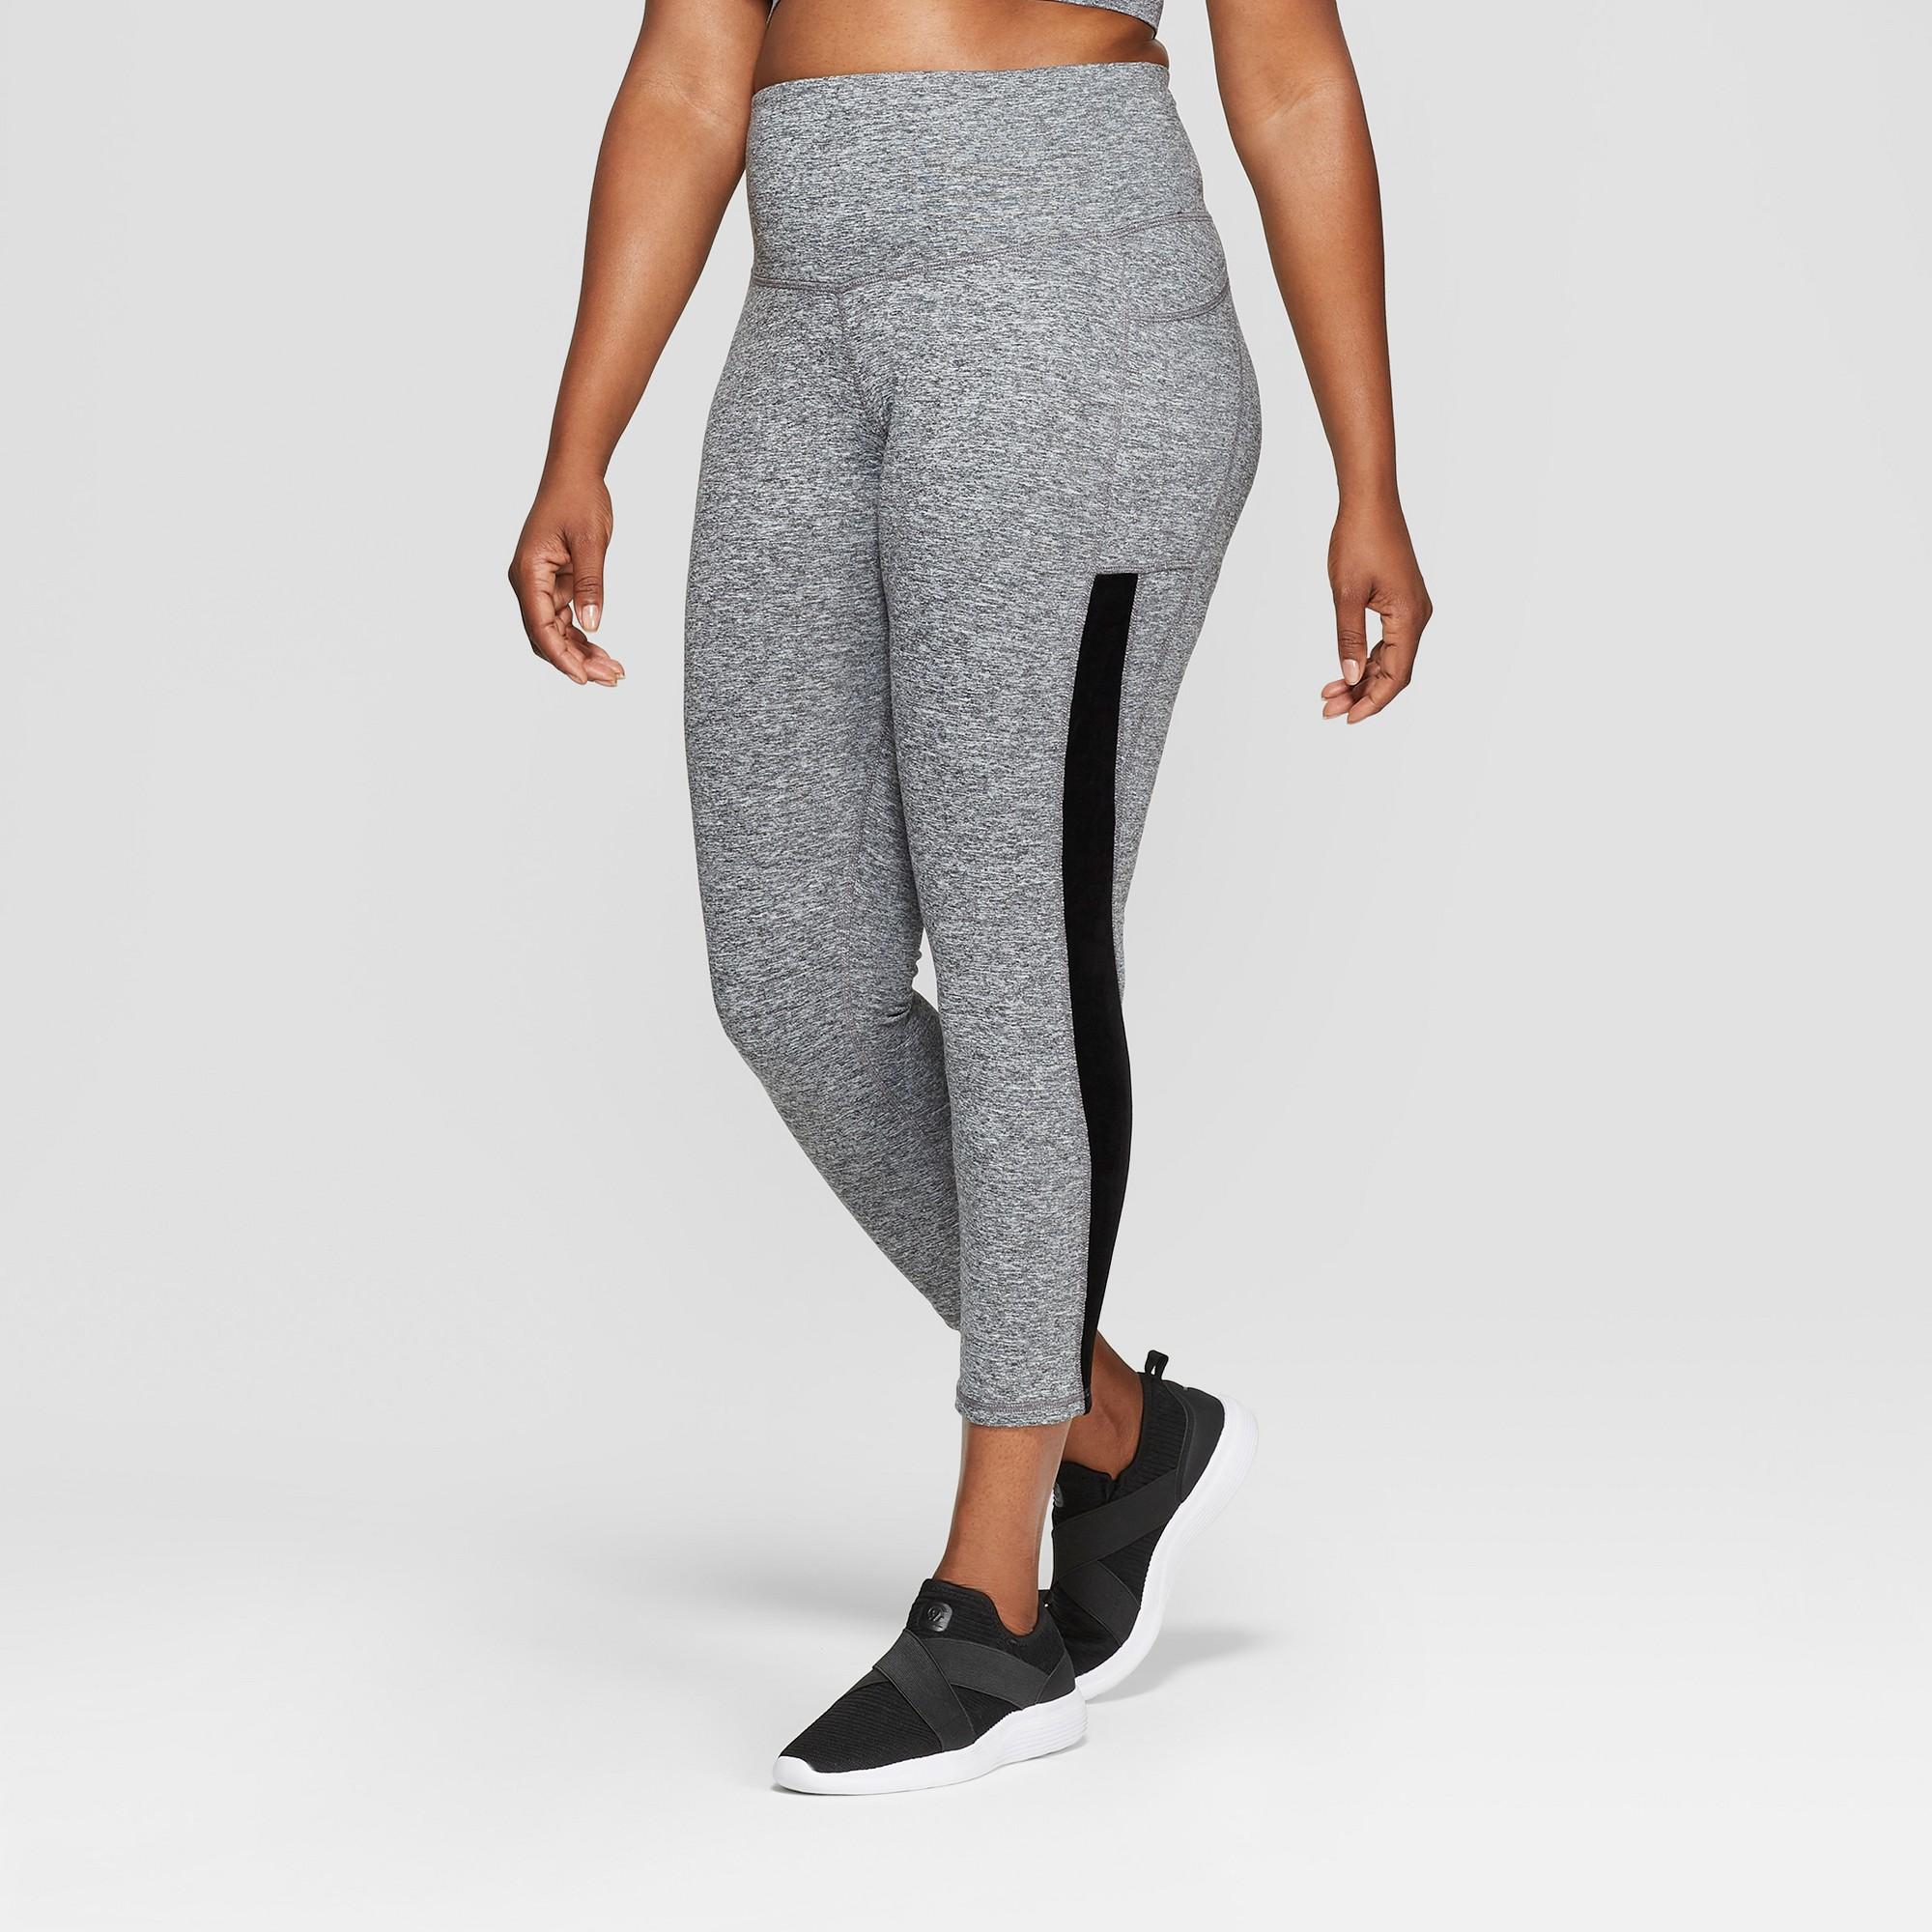 929220ea95b21 Women's Plus Size Studio High-Waisted Leggings - C9 Champion Ebony Heather  1X